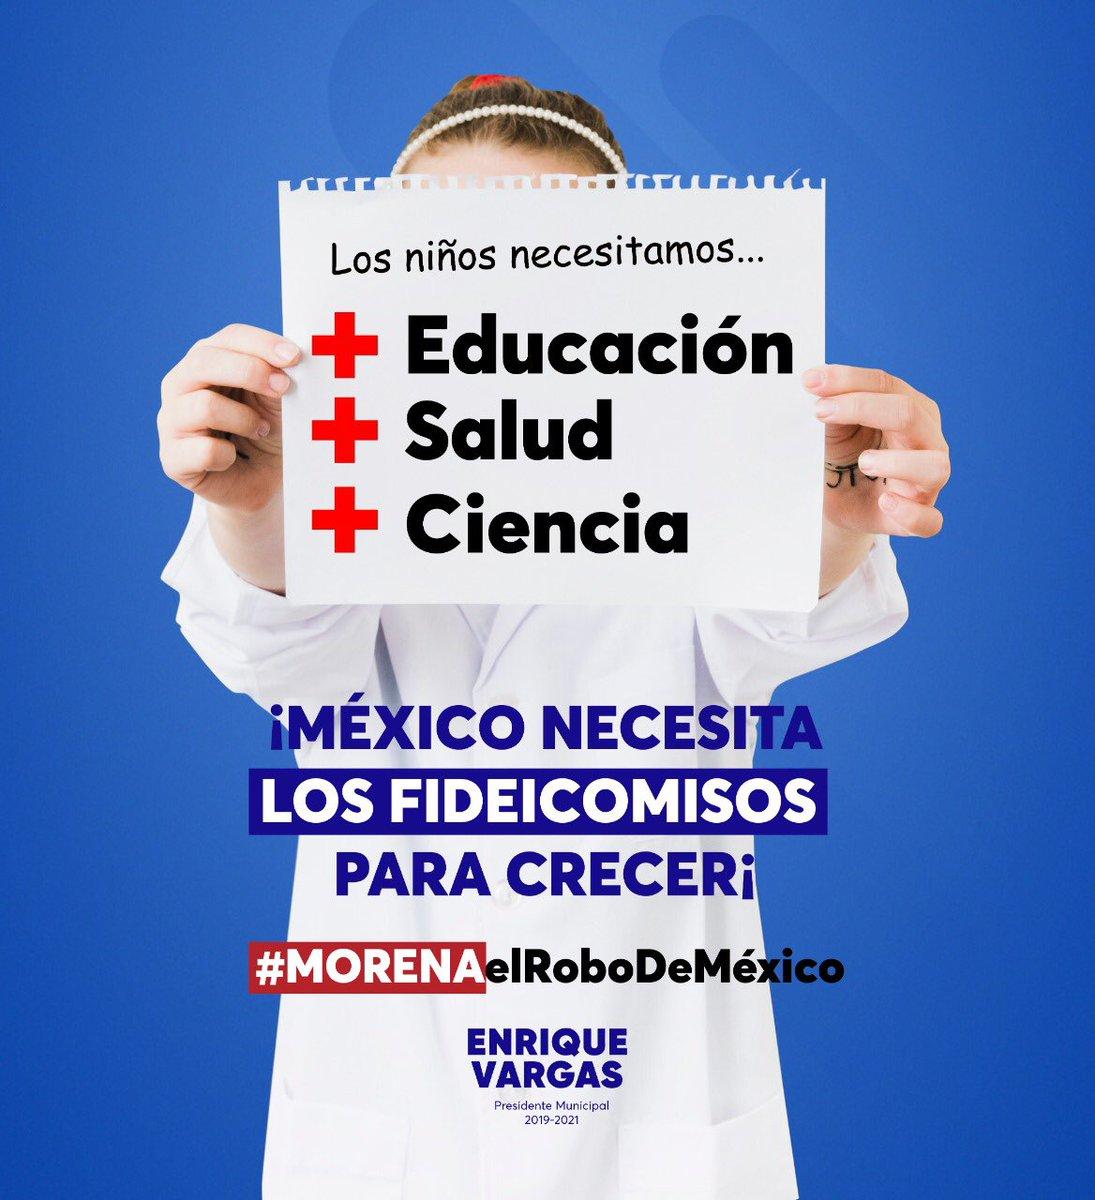 #MORENAelRoboDeMéxico https://t.co/cF1wCjYR6n